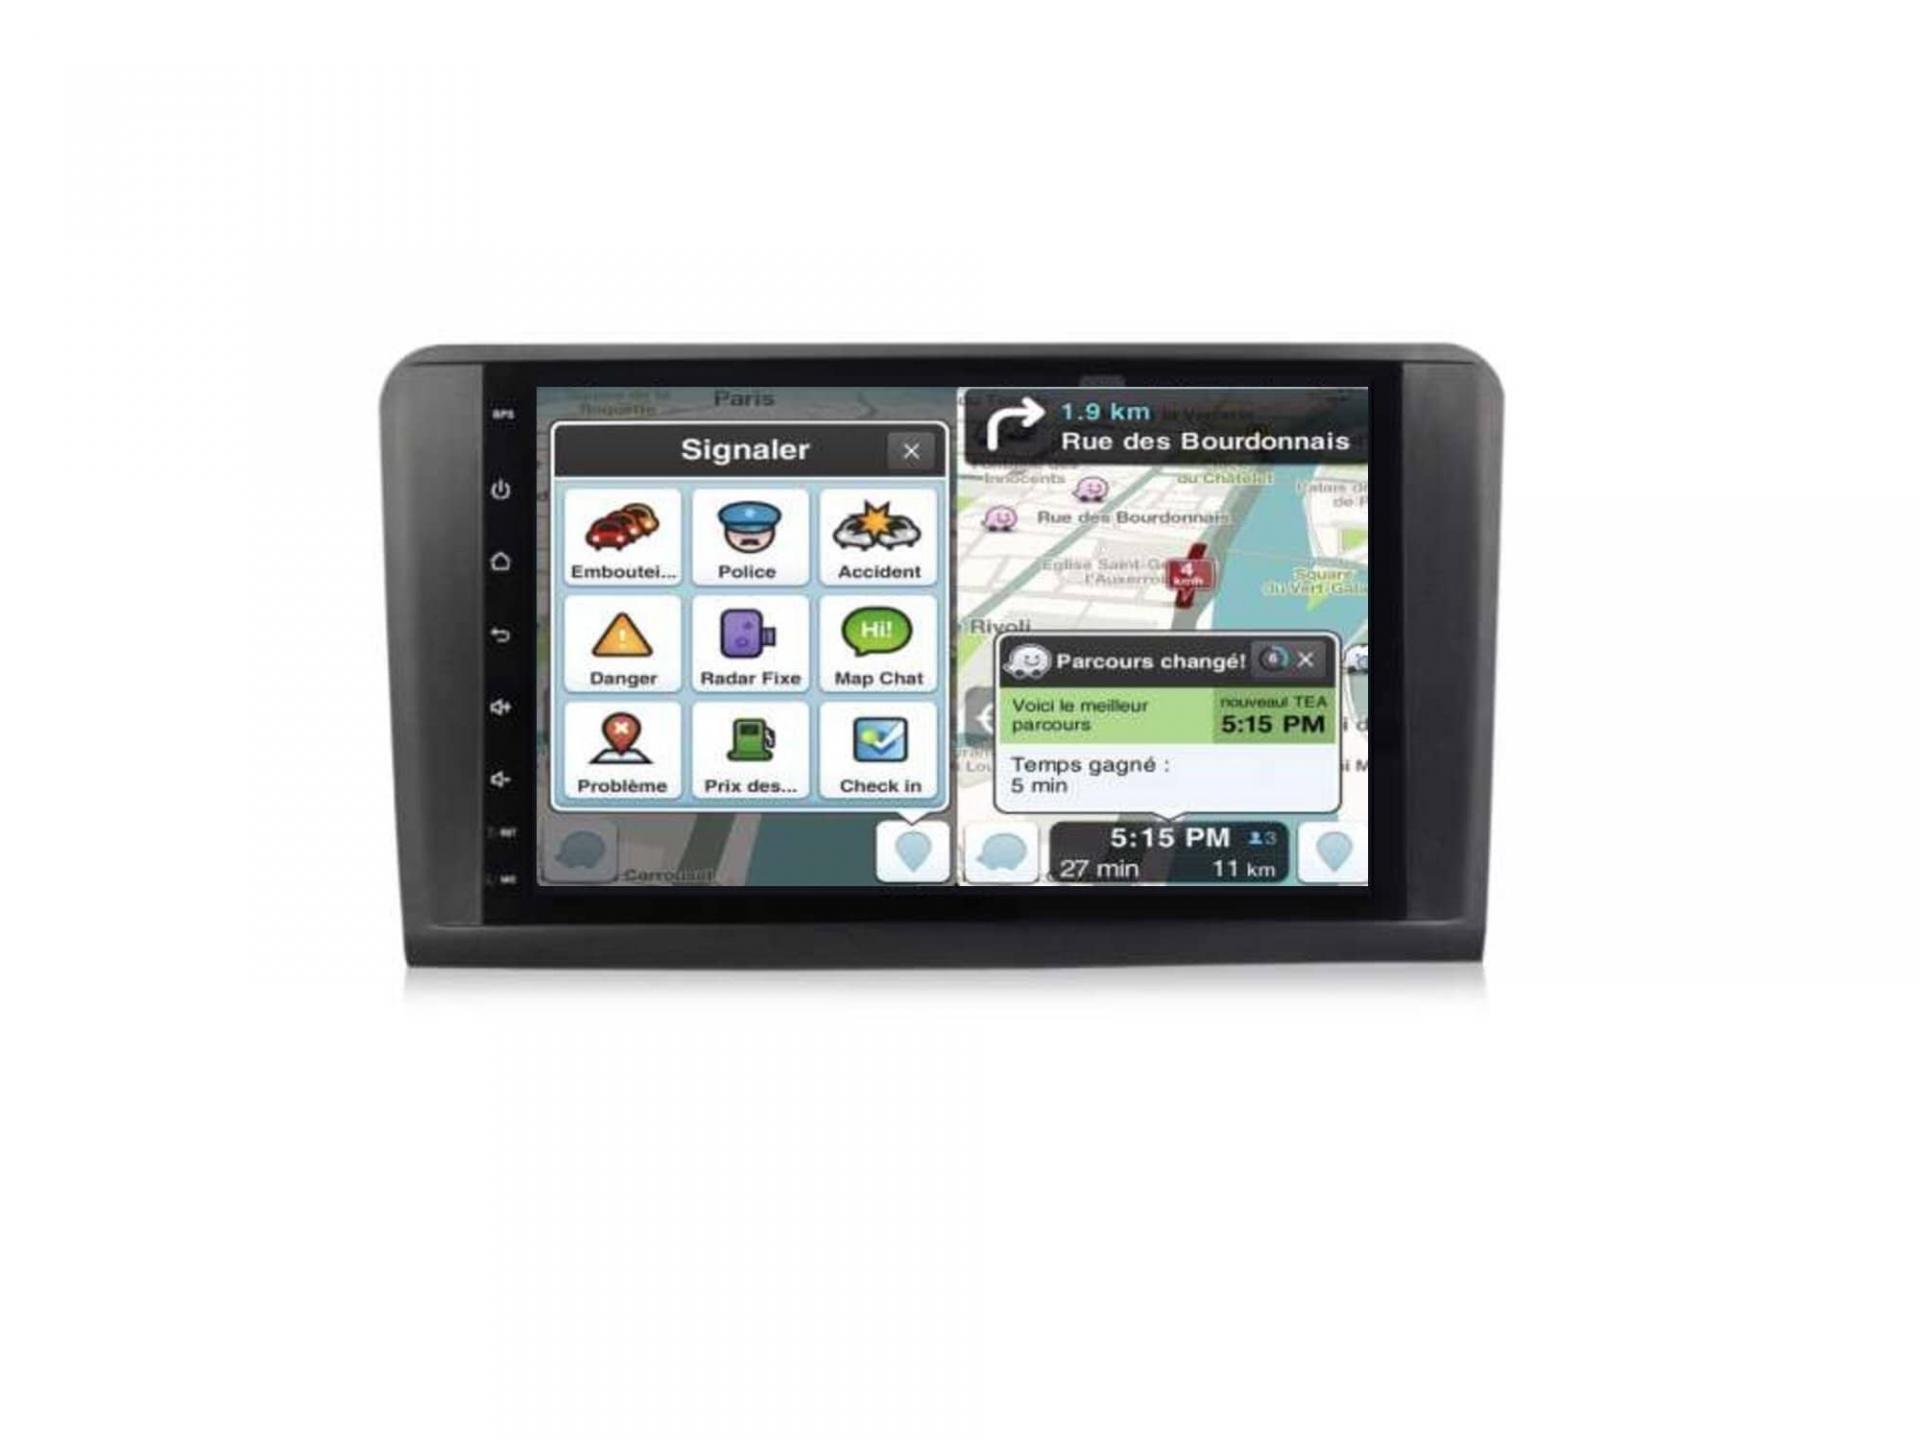 Autoradio gps carplay android auto bluetooth mercedes ml w164 gl x164 1